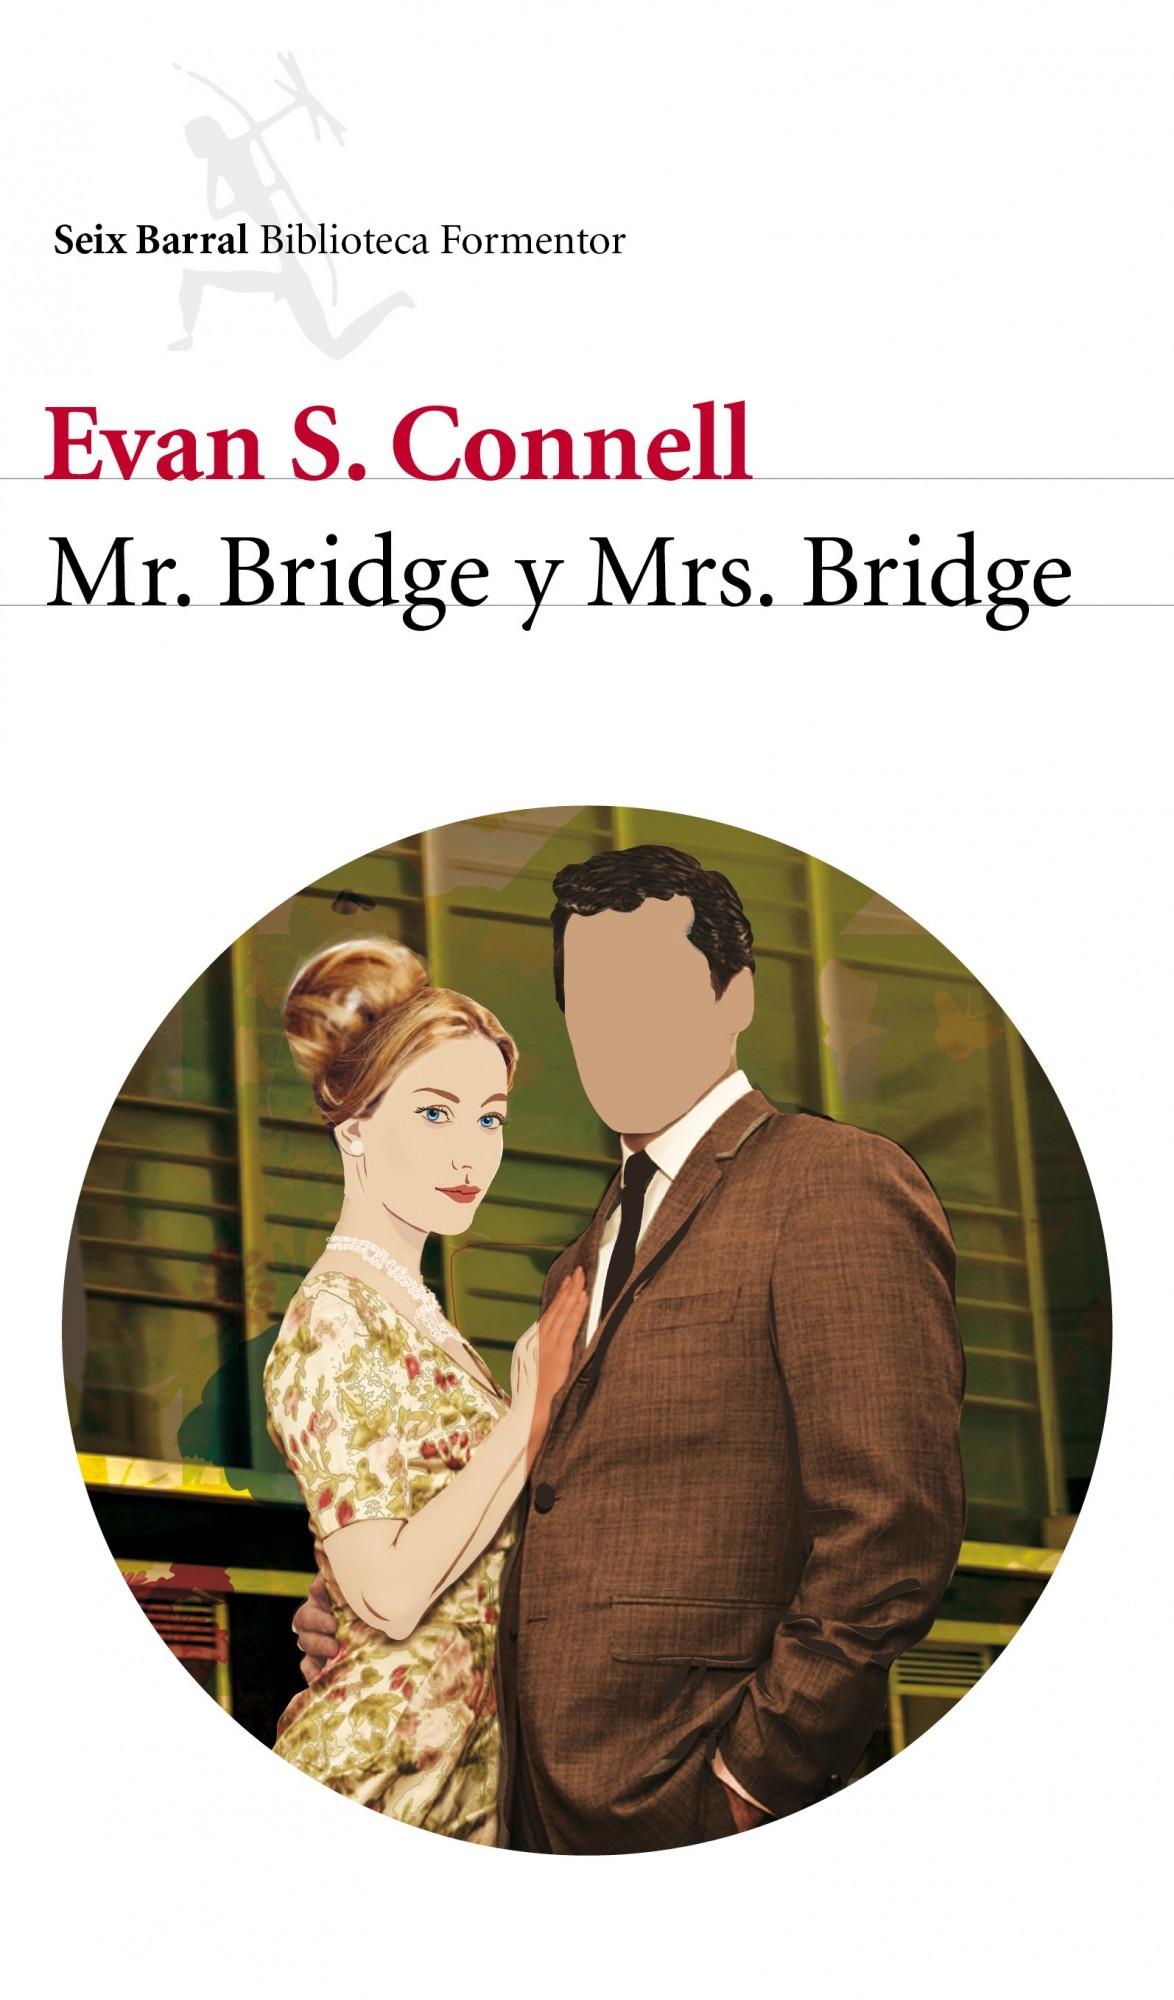 Mrs. Bridge y Mr. Bridge  Seix Barral. - Evan S. Connell - Seix Barral